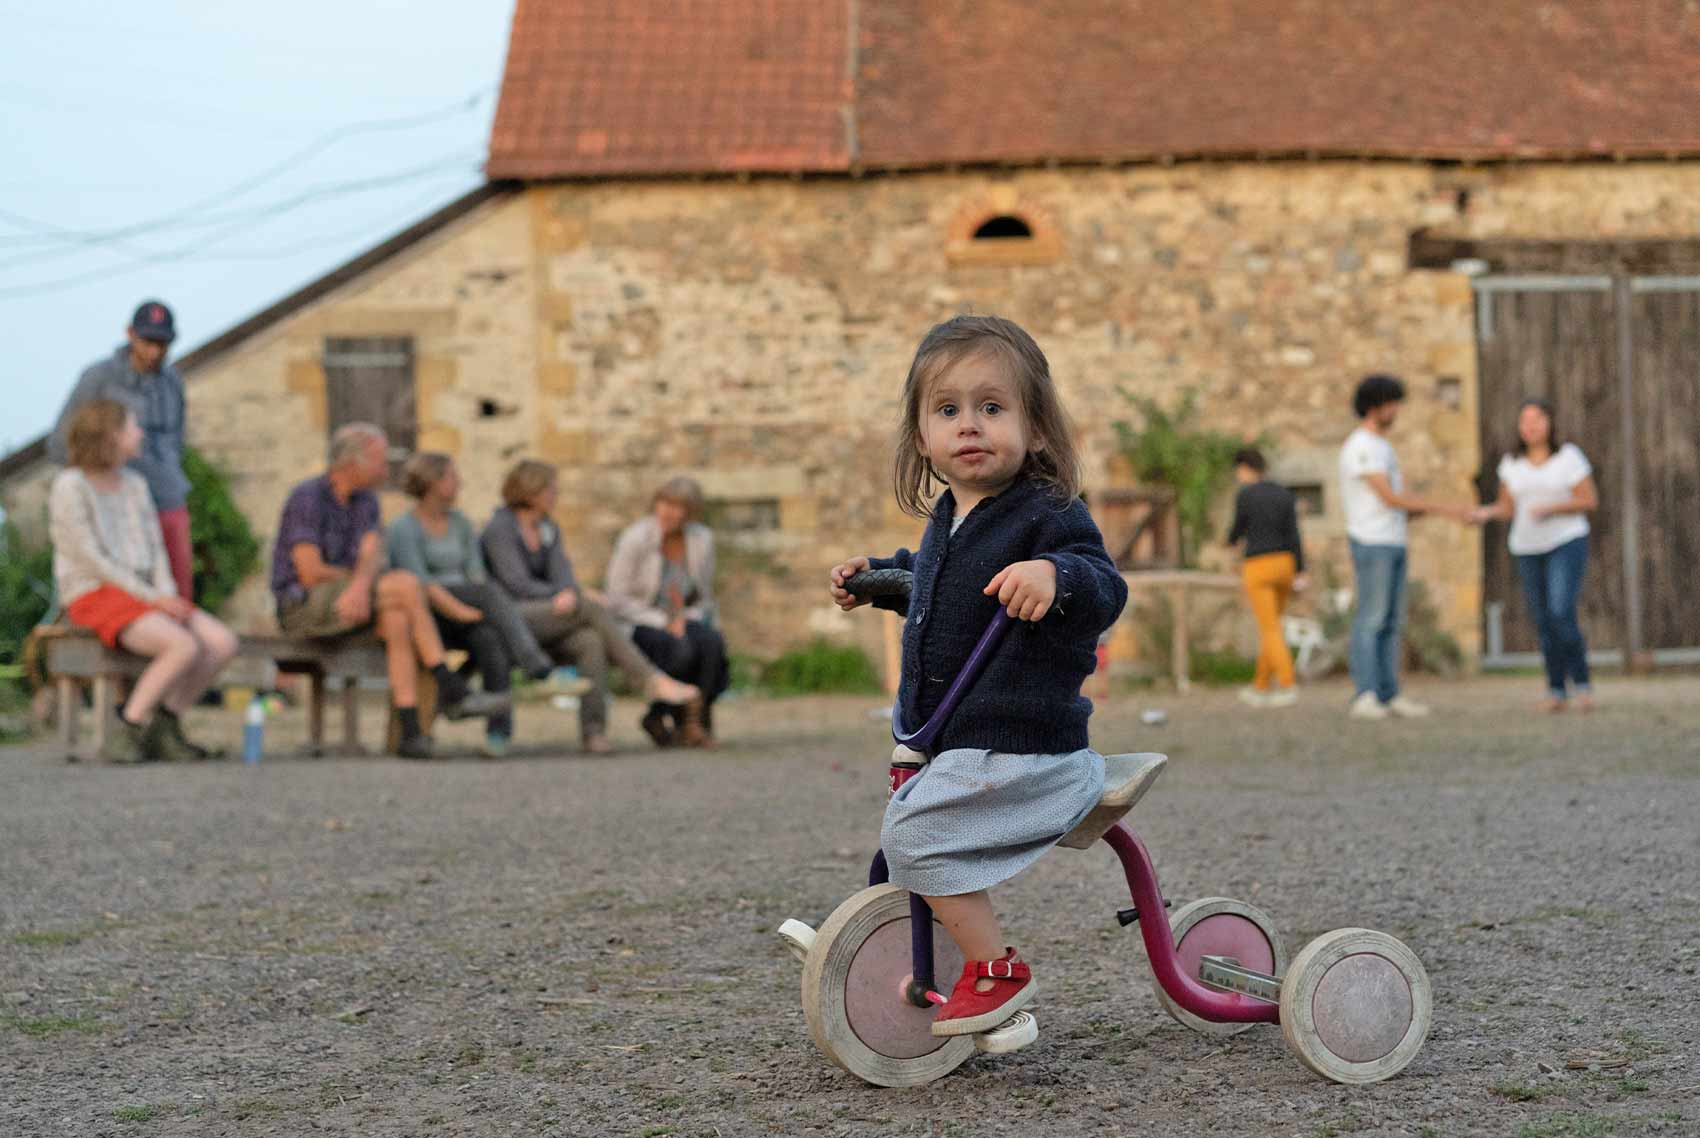 Kinderparadijs, meisje op driewieler, Brénazet, Allier, Auvergne